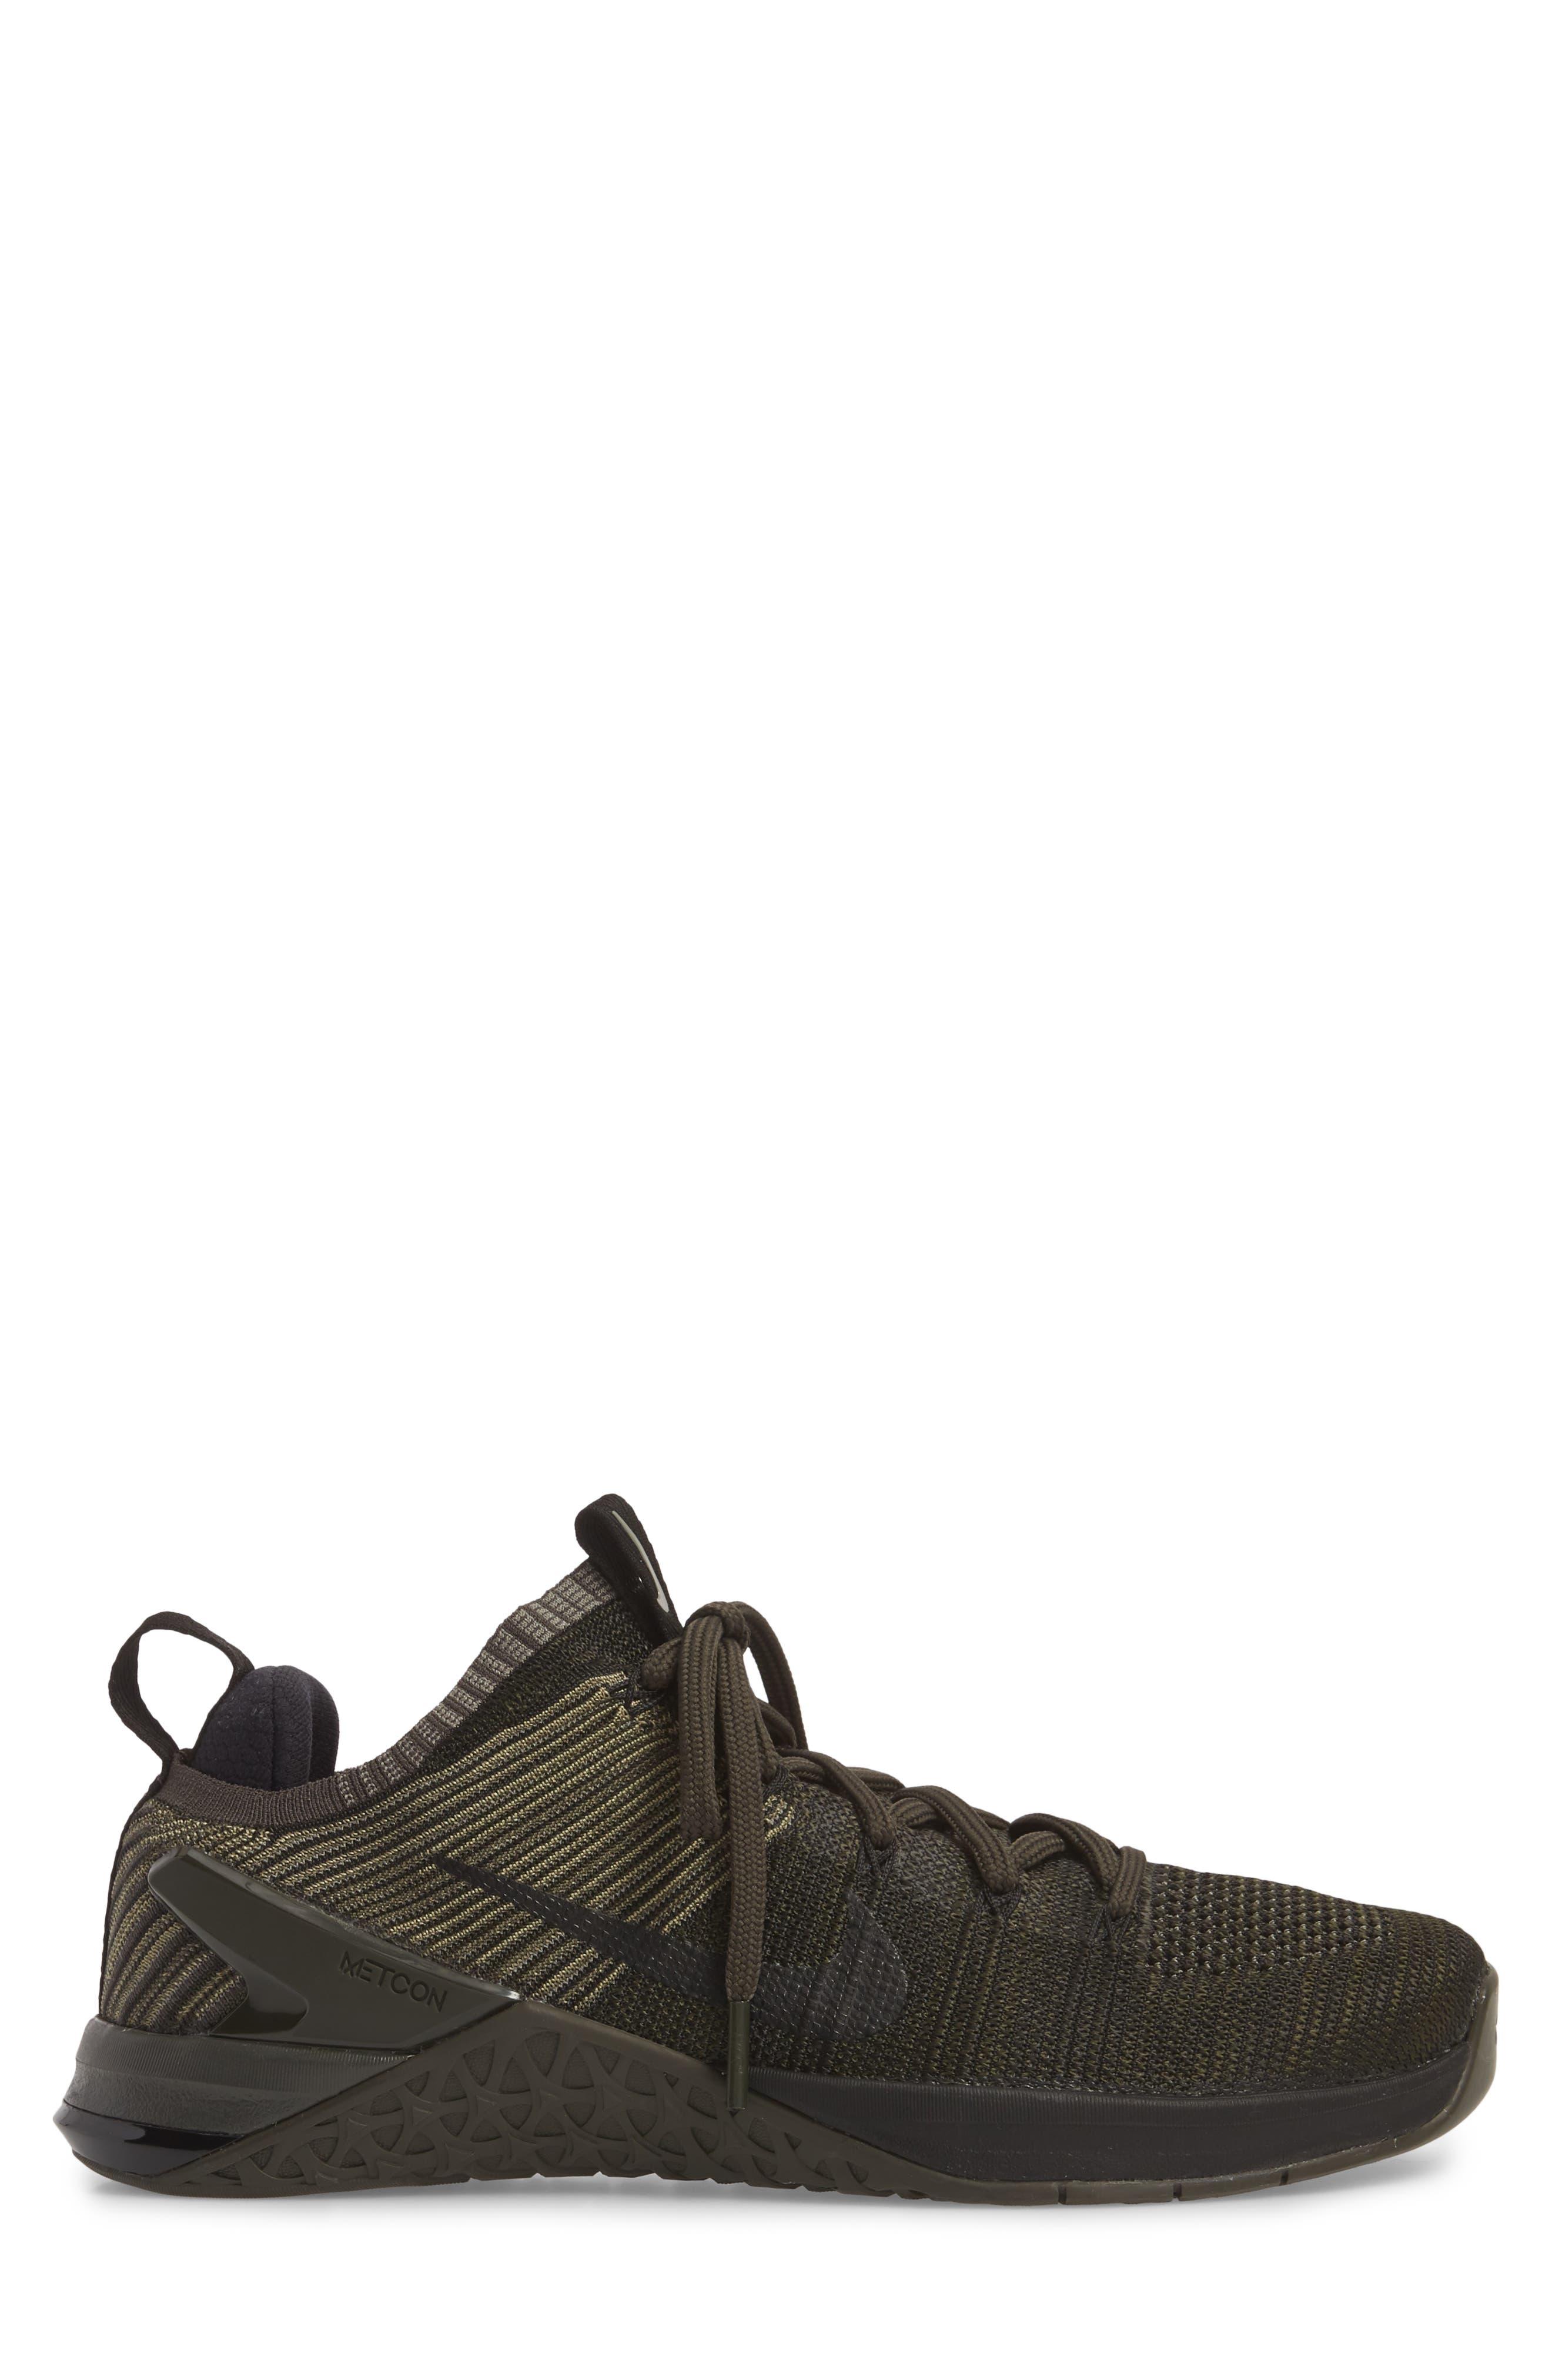 Metcon DSX Flyknit 2 Training Shoe,                             Alternate thumbnail 3, color,                             DARK STUCCO/ BLACK/ NEWSPRINT